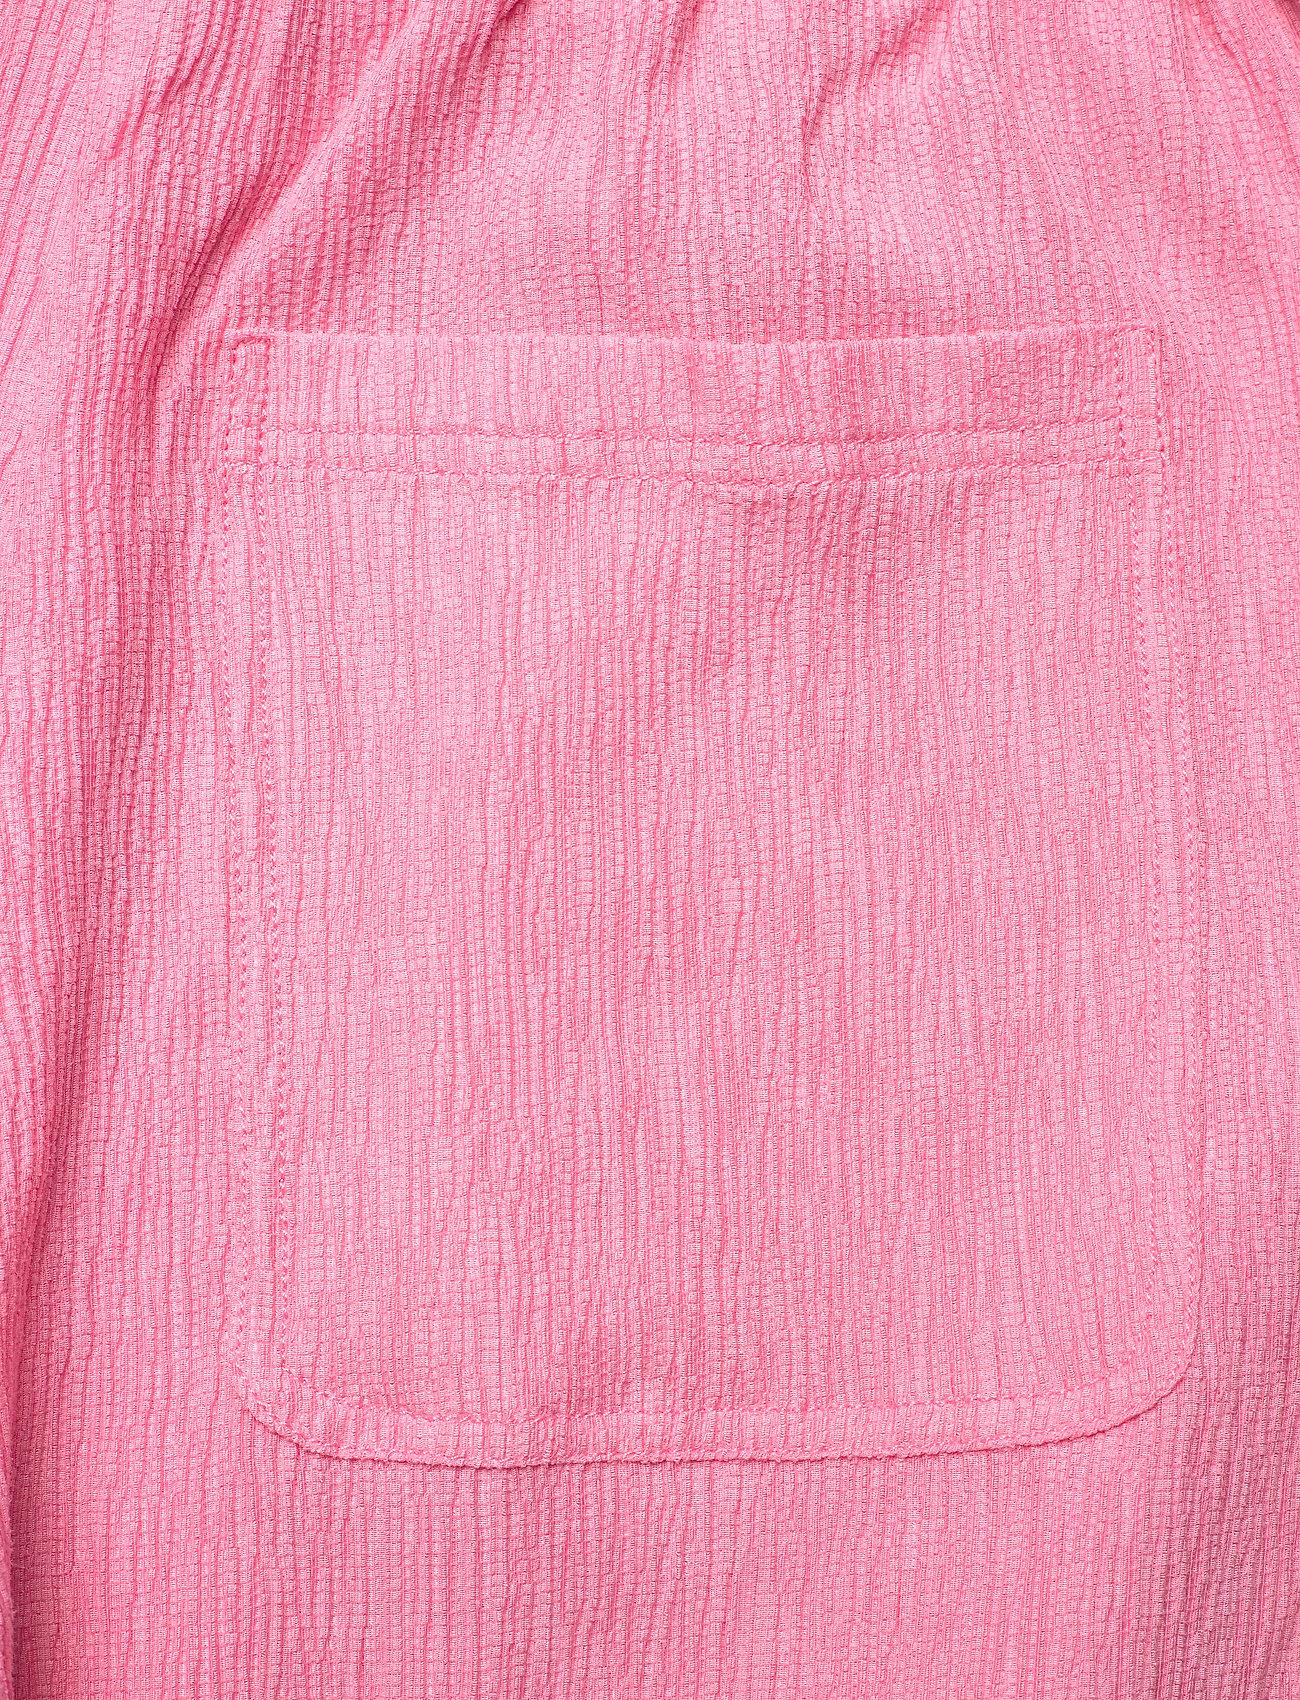 STINE GOYA - Gulcan, 1213 Crinkled Tencel - casual bukser - pink - 4